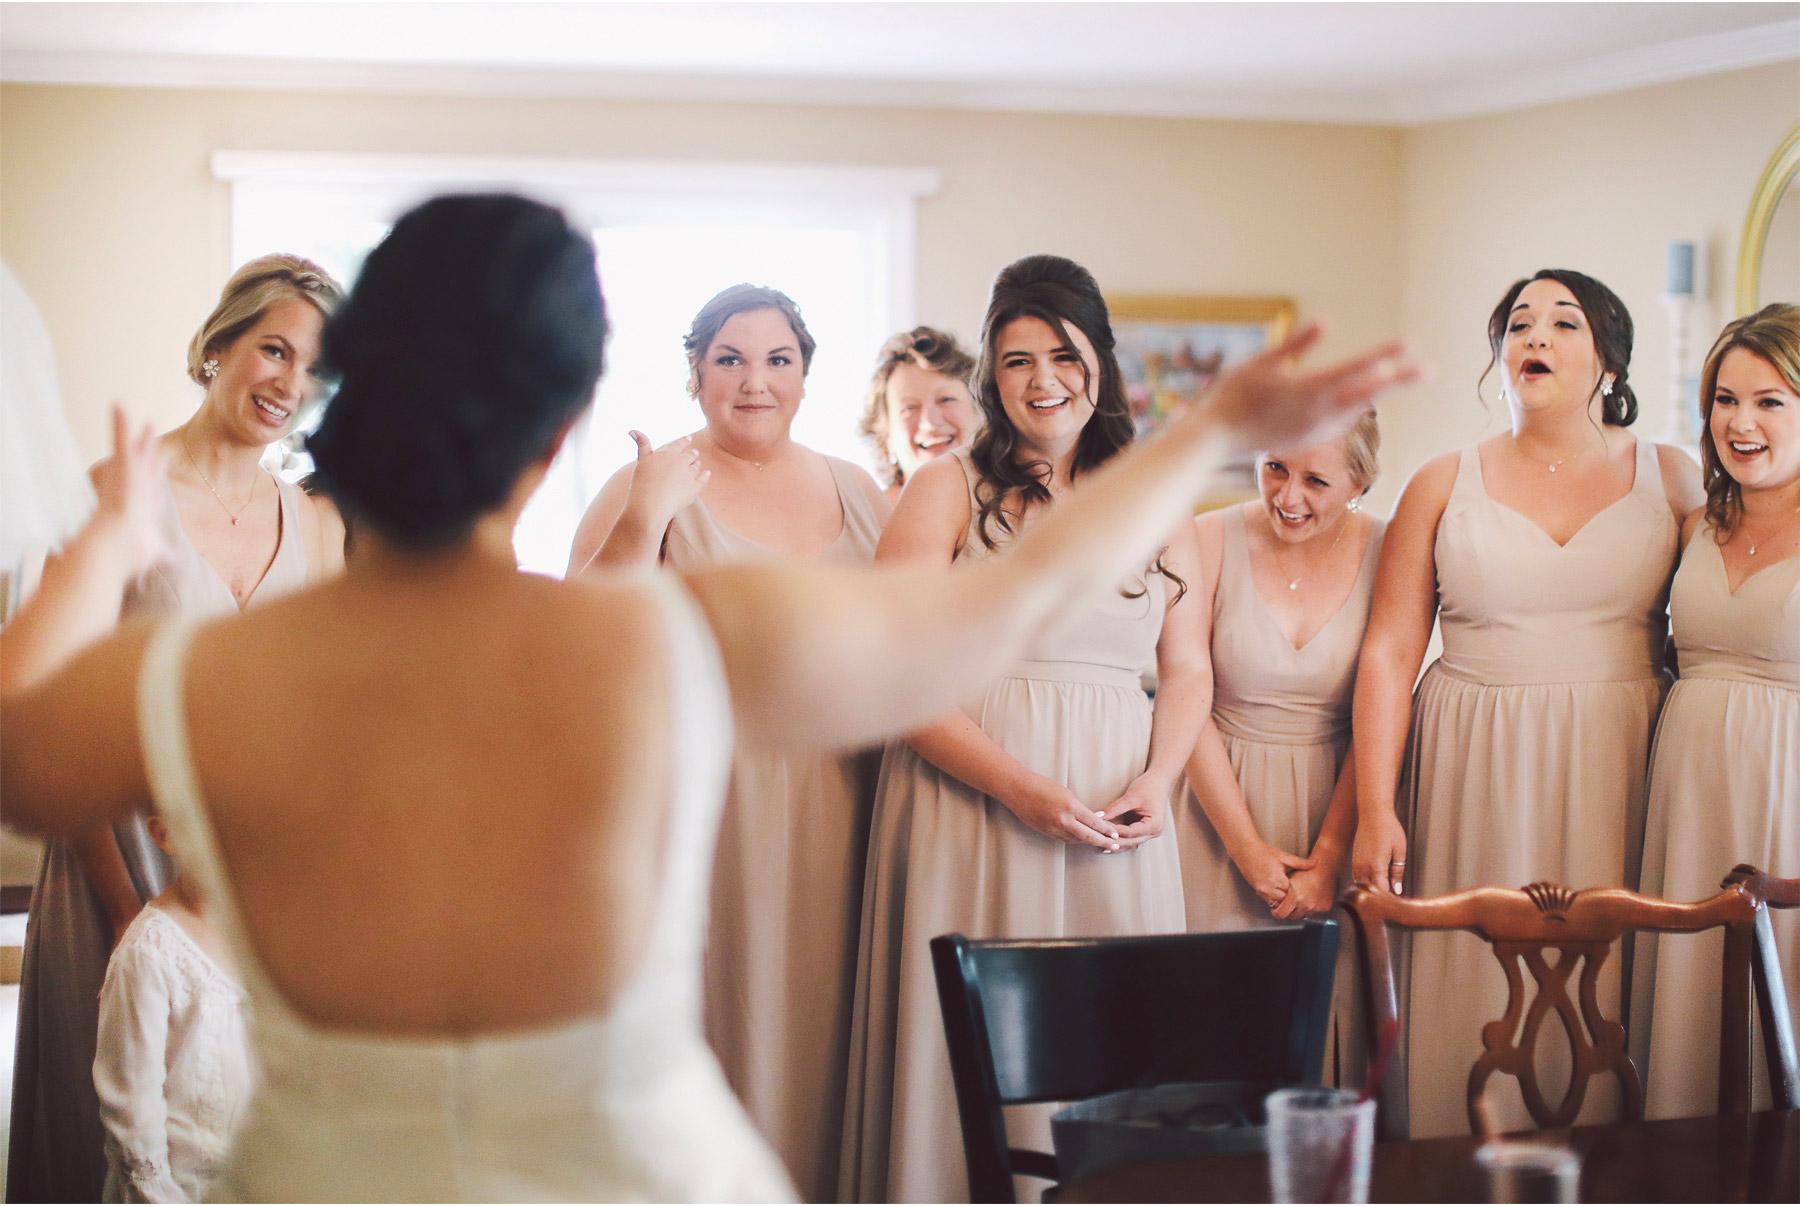 02-Vick-Photography-Wedding-Minneapolis-Minnesota-Bride-Dress-Bridesmaids-Erin-and-David.jpg